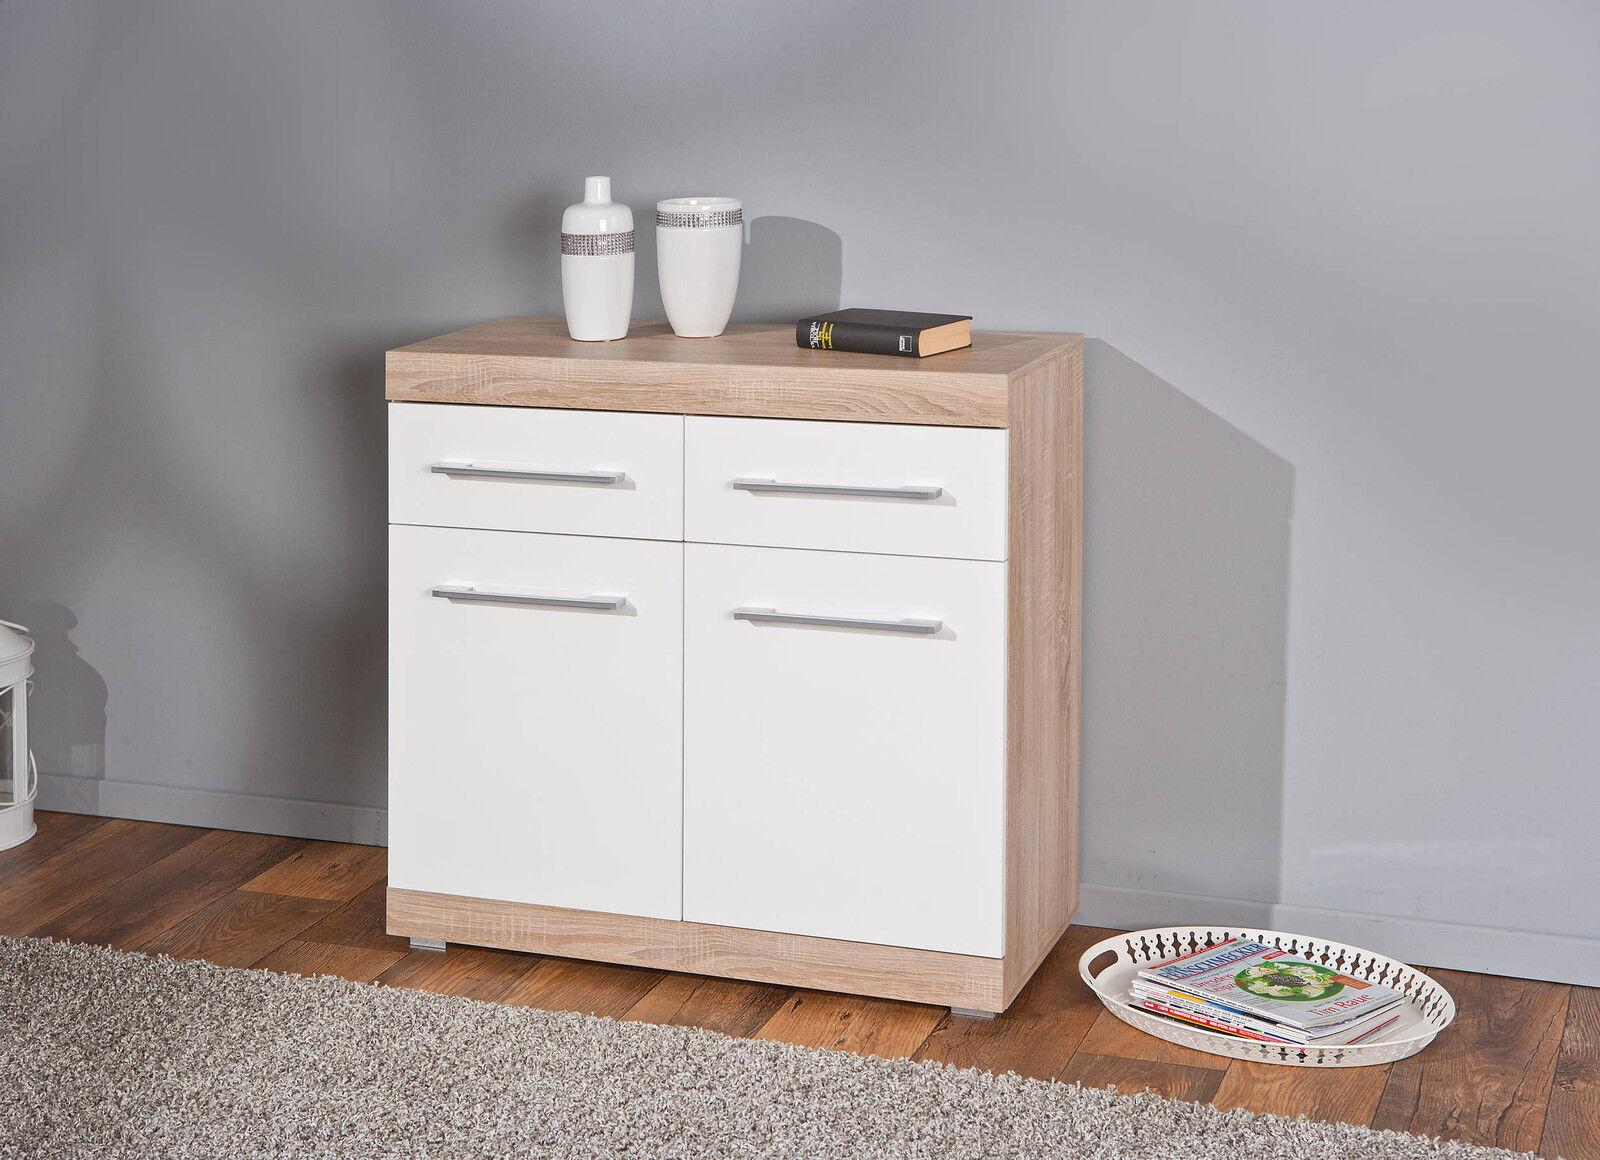 kommode sideboard holzkommode schrank holz hochglanz wei. Black Bedroom Furniture Sets. Home Design Ideas